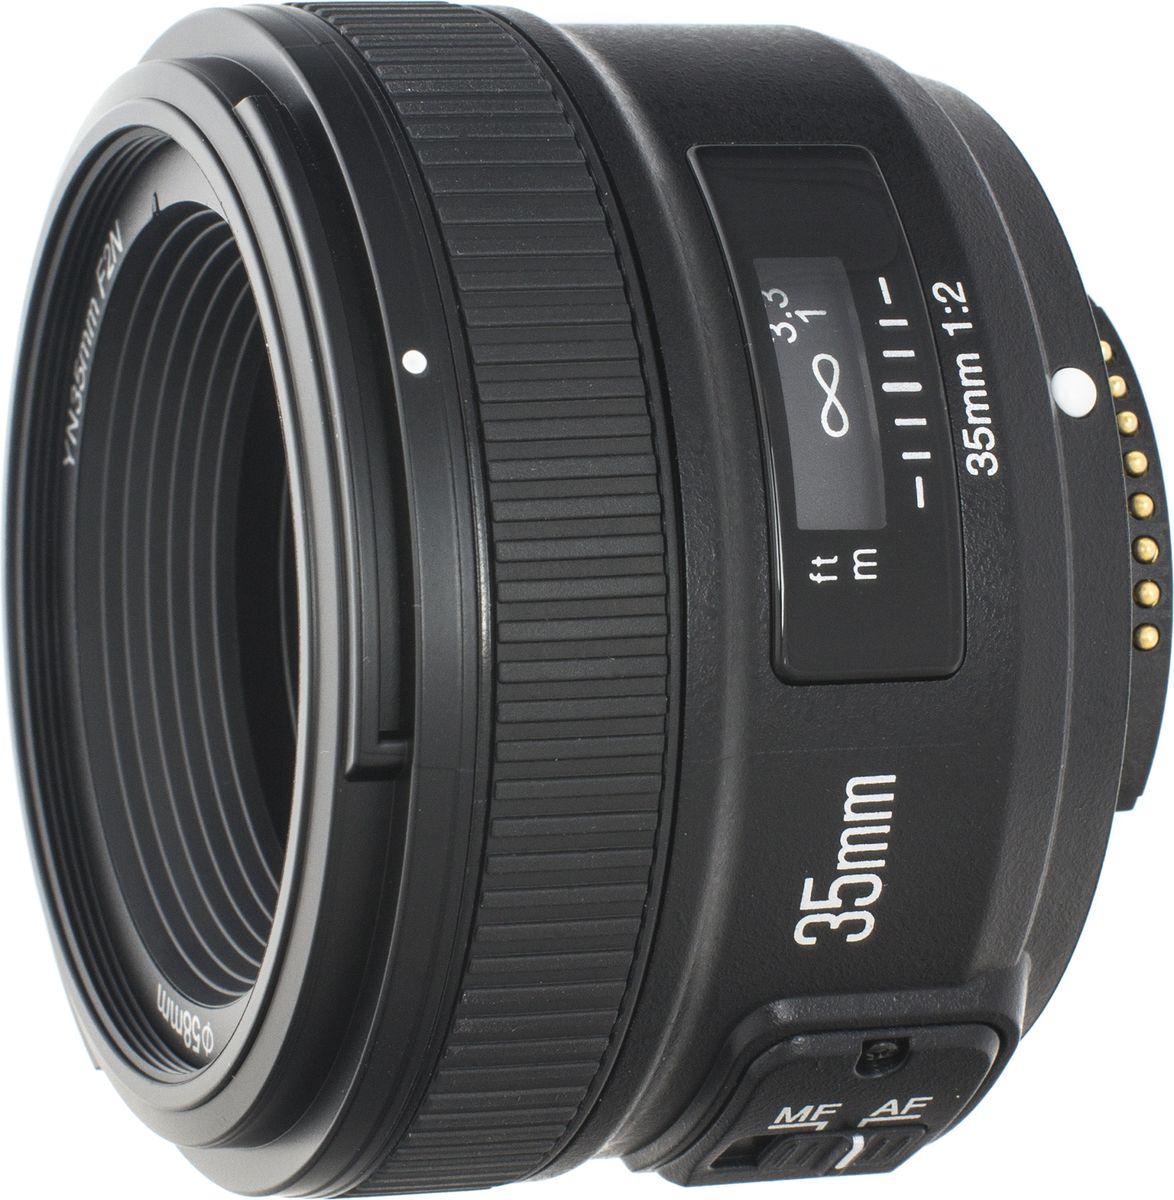 Объектив Yongnuo 35F2.0 для Nikon yongnuo yn560 tx n manual flash controller wireless trigger shutter receiver for nikon dslr camera